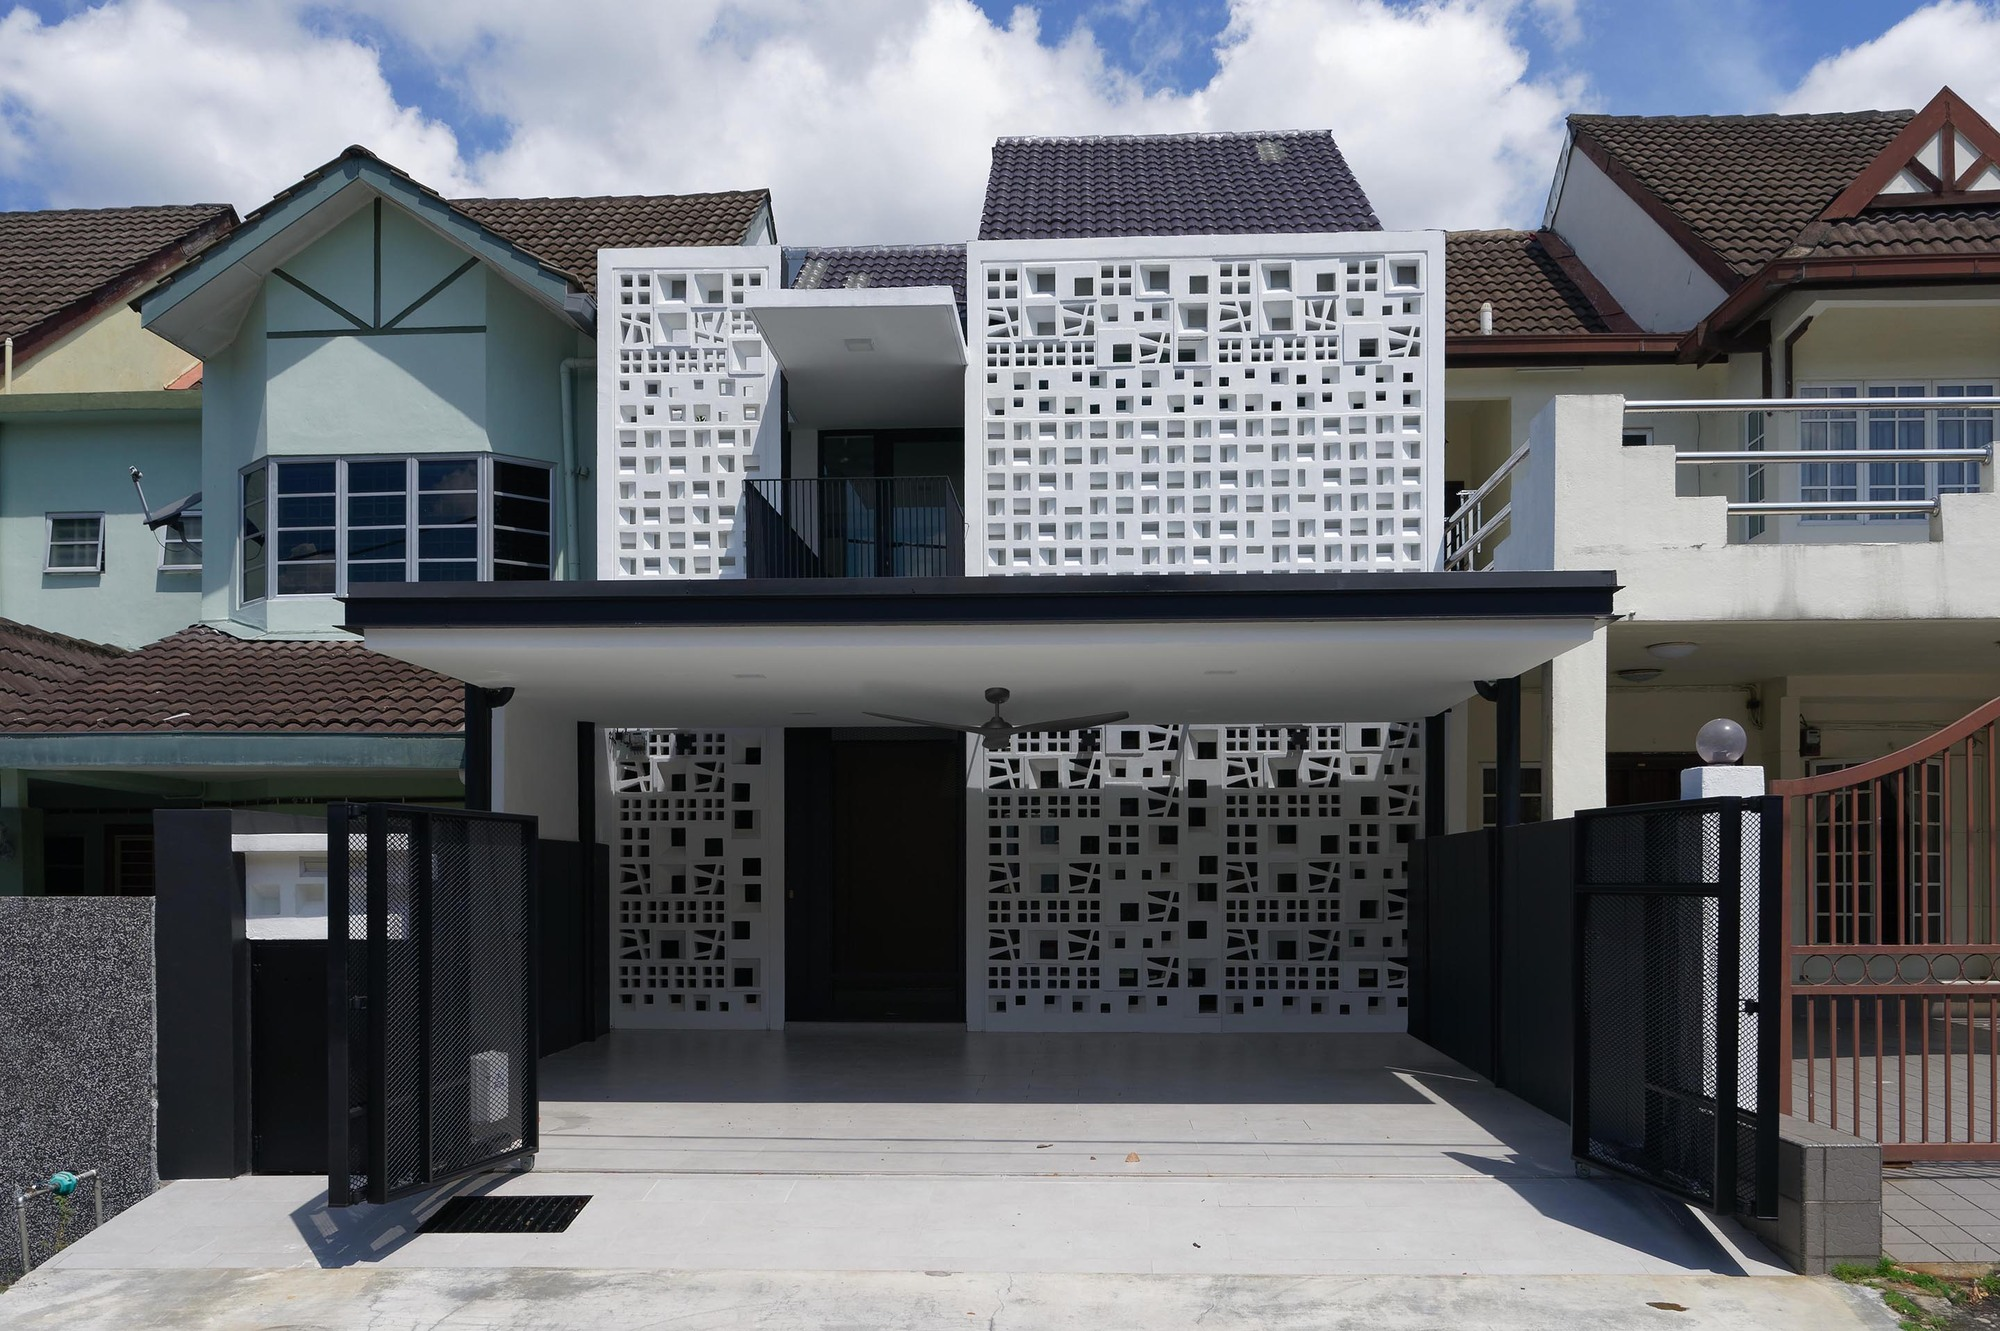 malaysian house design style Home Design 20+ Malaysian House Design Style Pictures